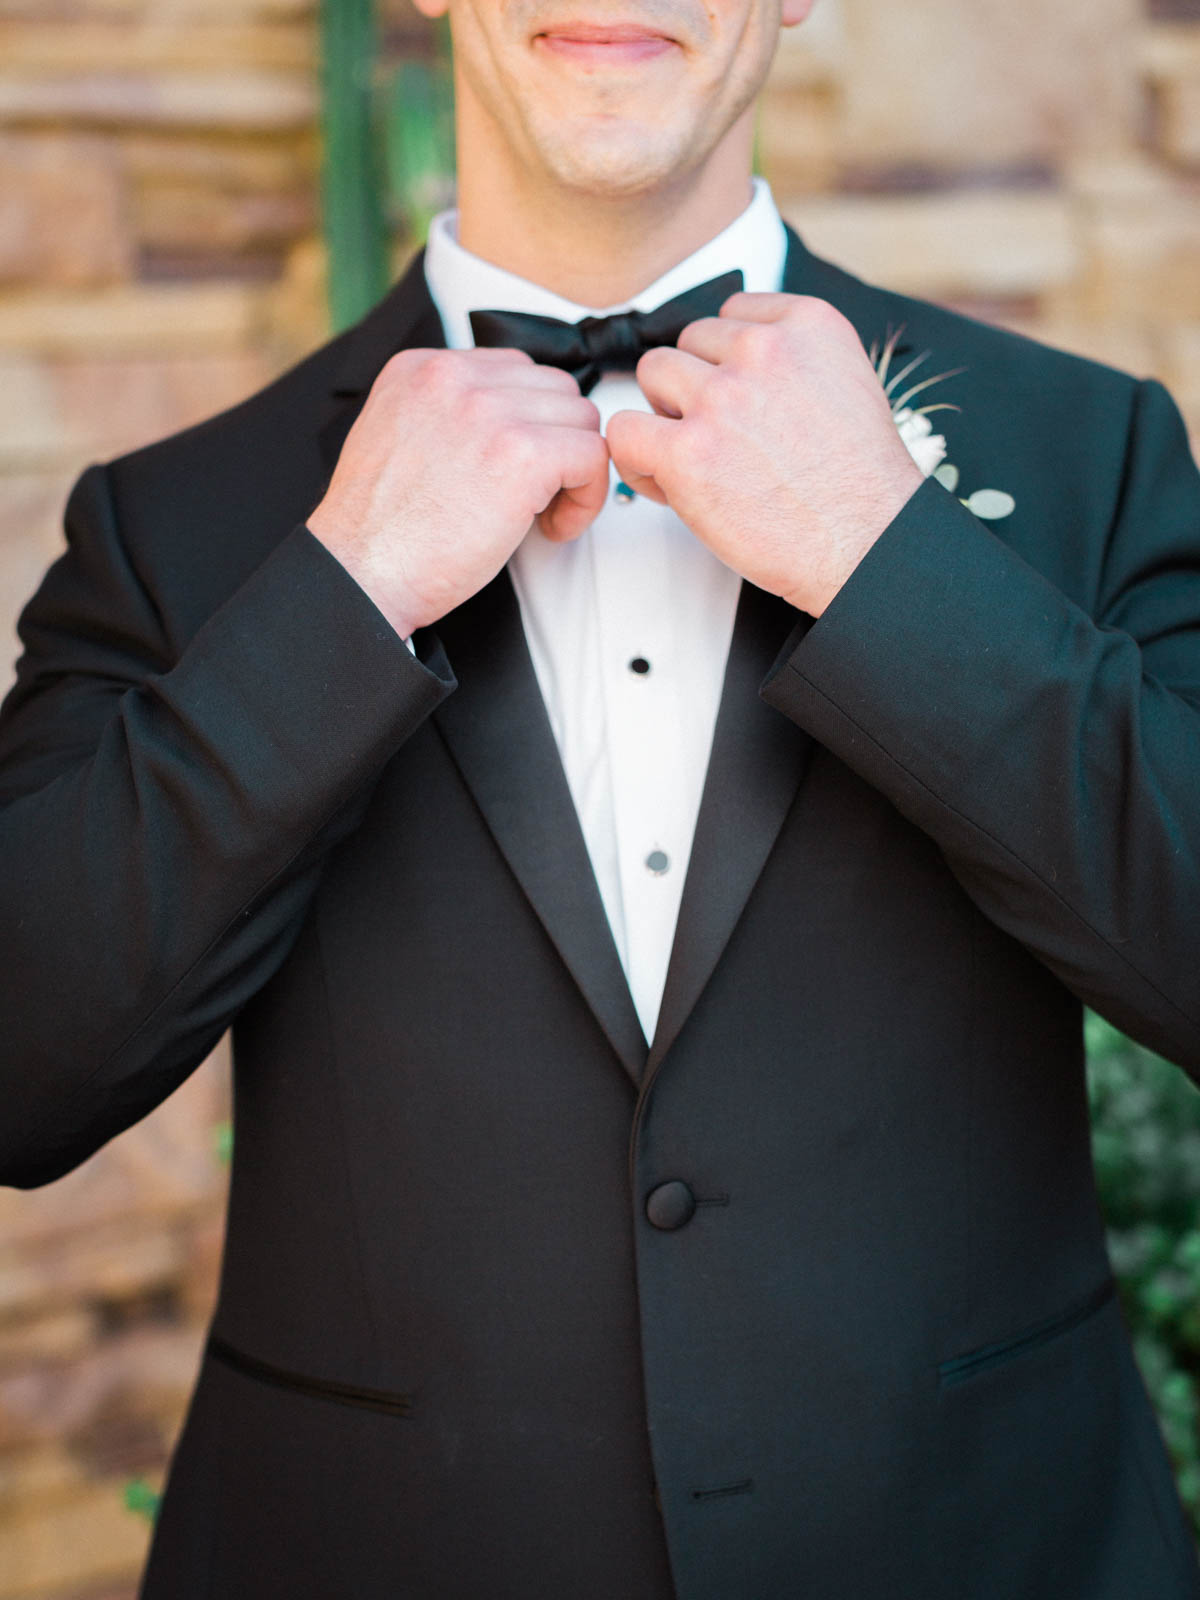 Jw marriott Starr Pass wedding captured by Tucson Wedding Photographers Betsy & John